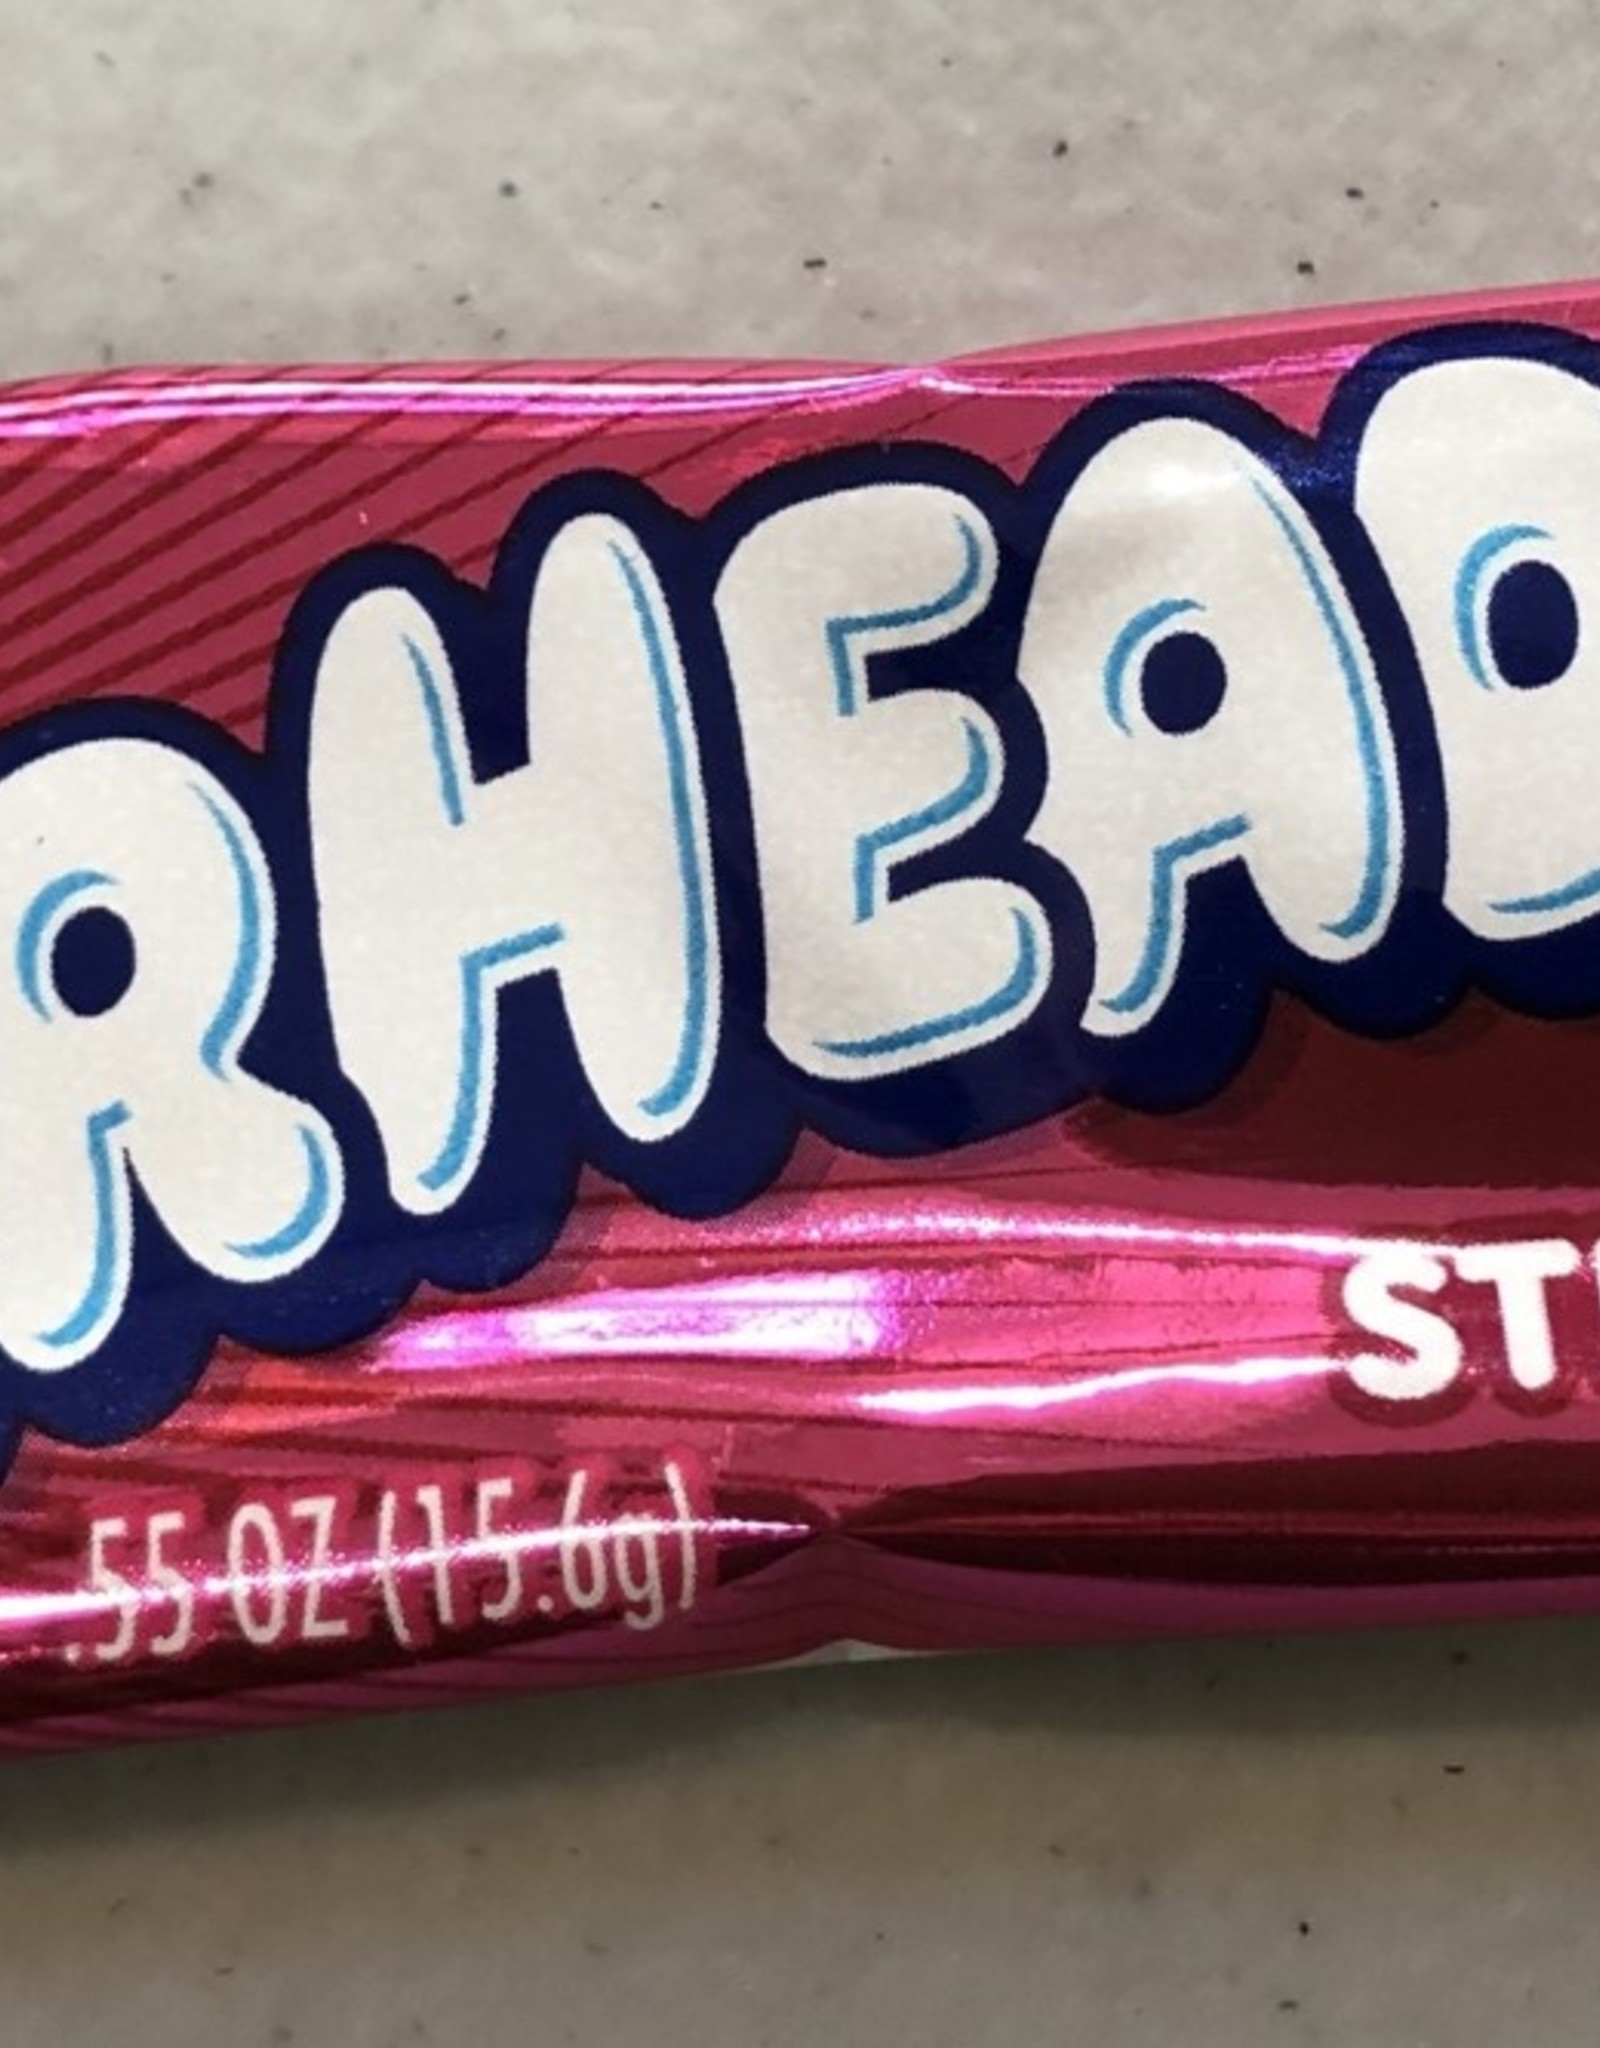 Perfetti Van Melle Usa, Inc. Airheads Strawberry